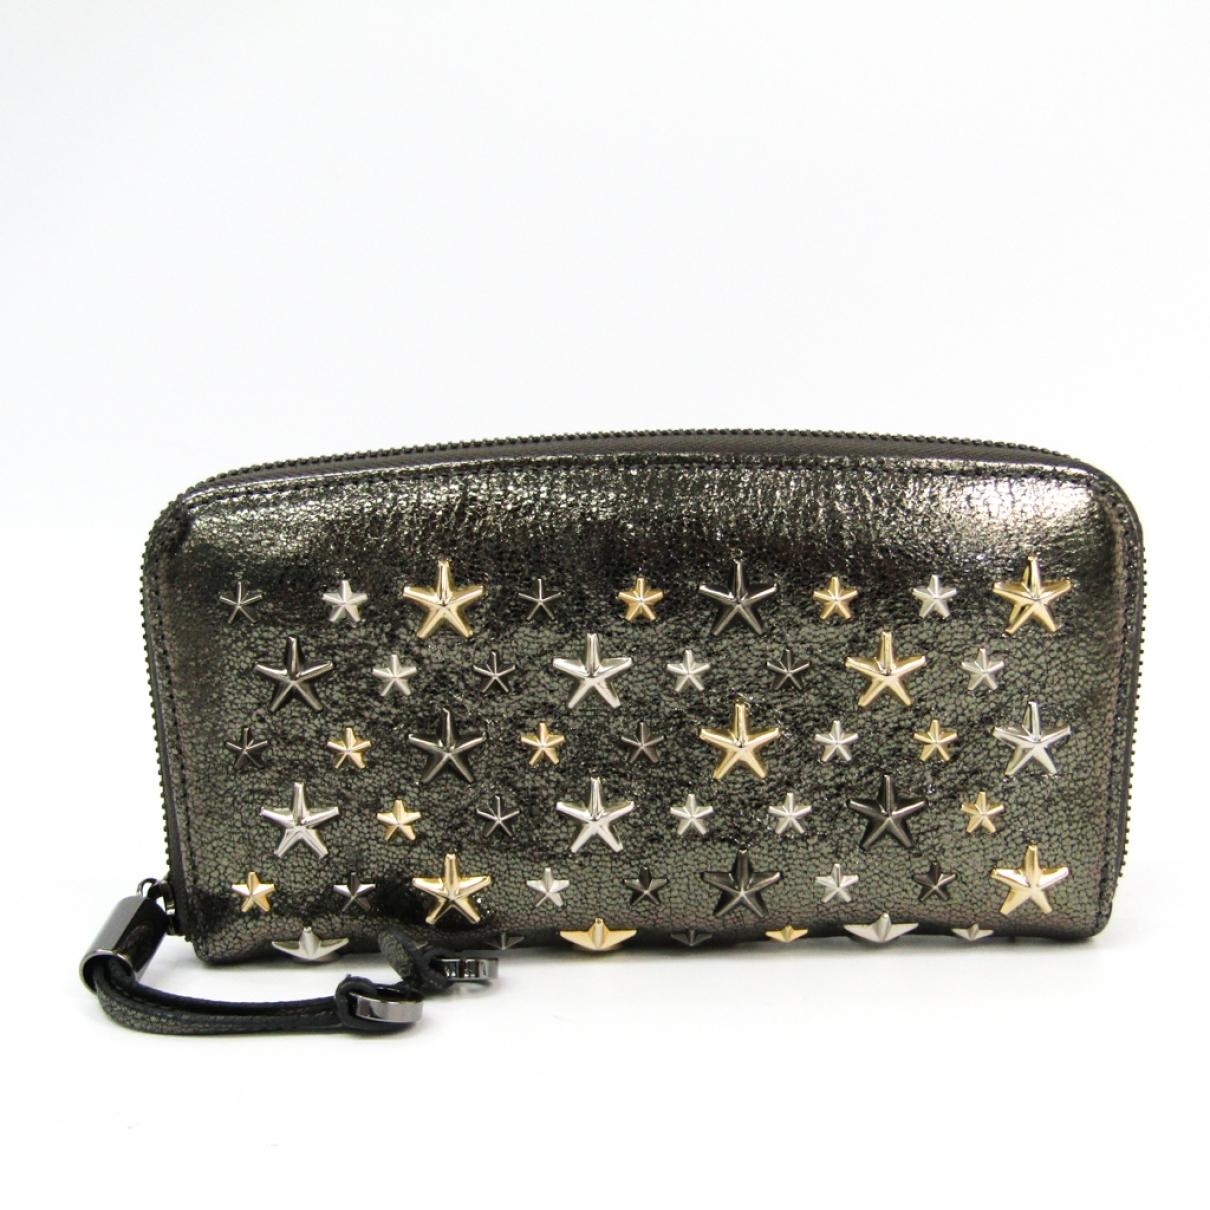 Jimmy Choo \N Grey Leather wallet for Women \N